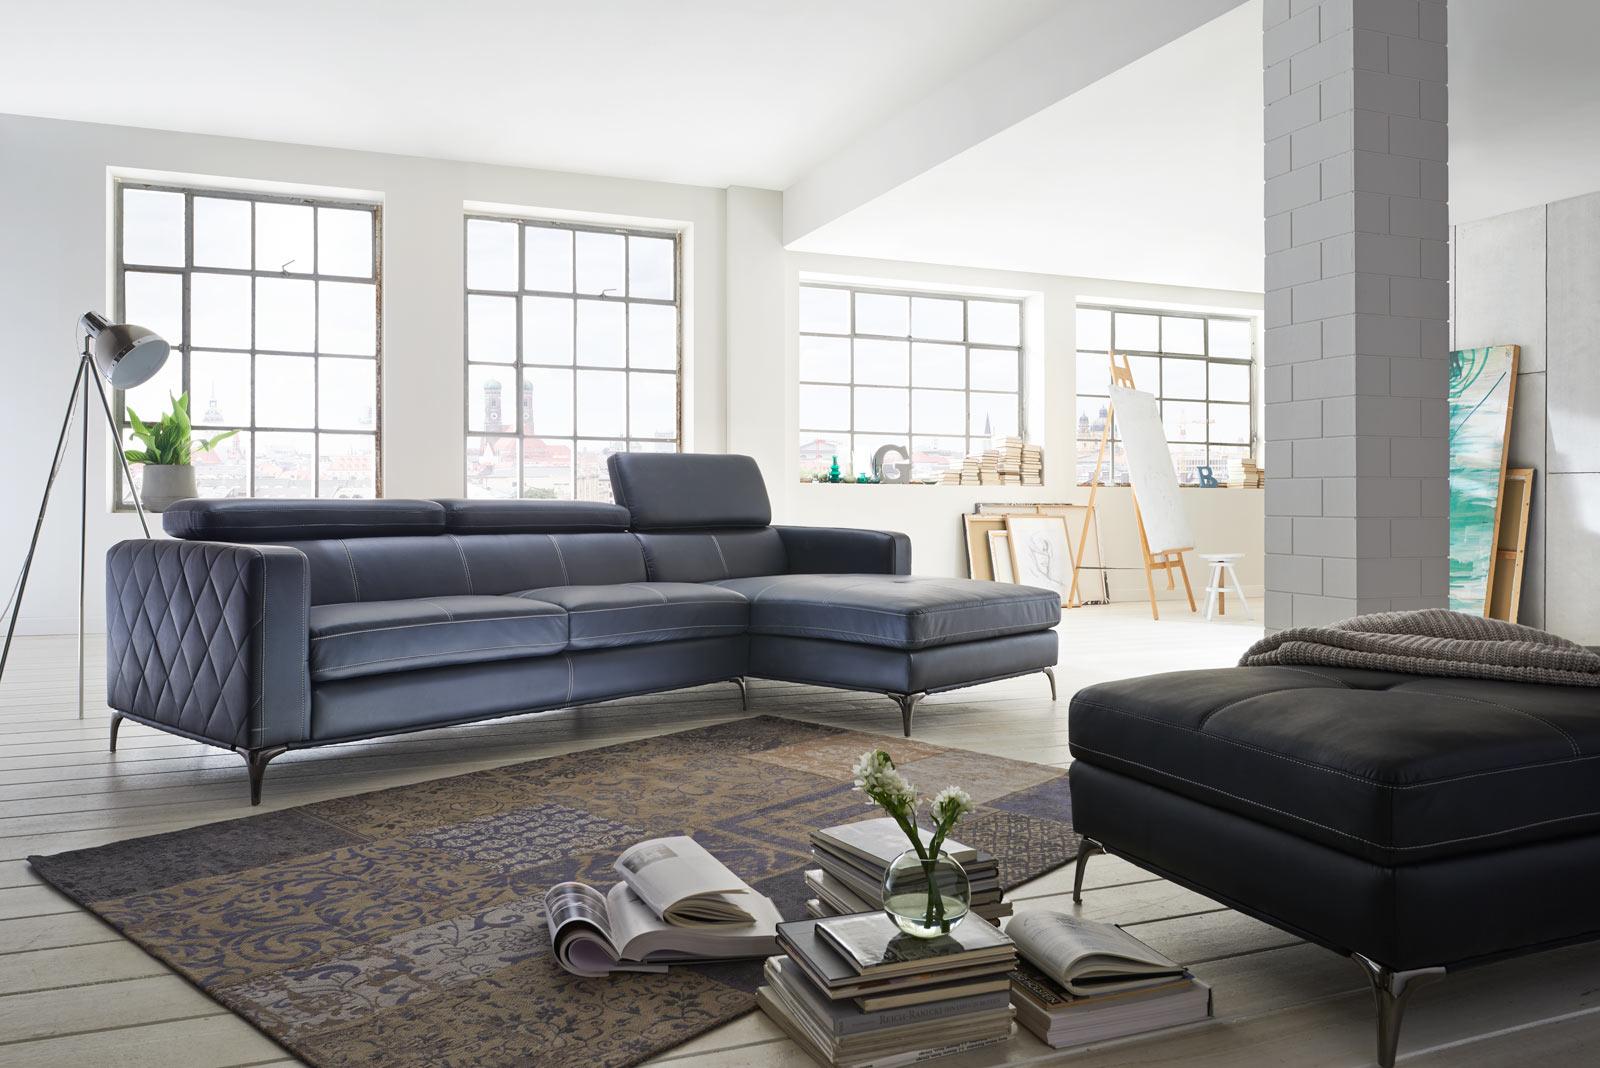 Sale sofa ecksofa anthrazit ottomane rechts 300 x 132 cm dario for Ecksofa 300 cm